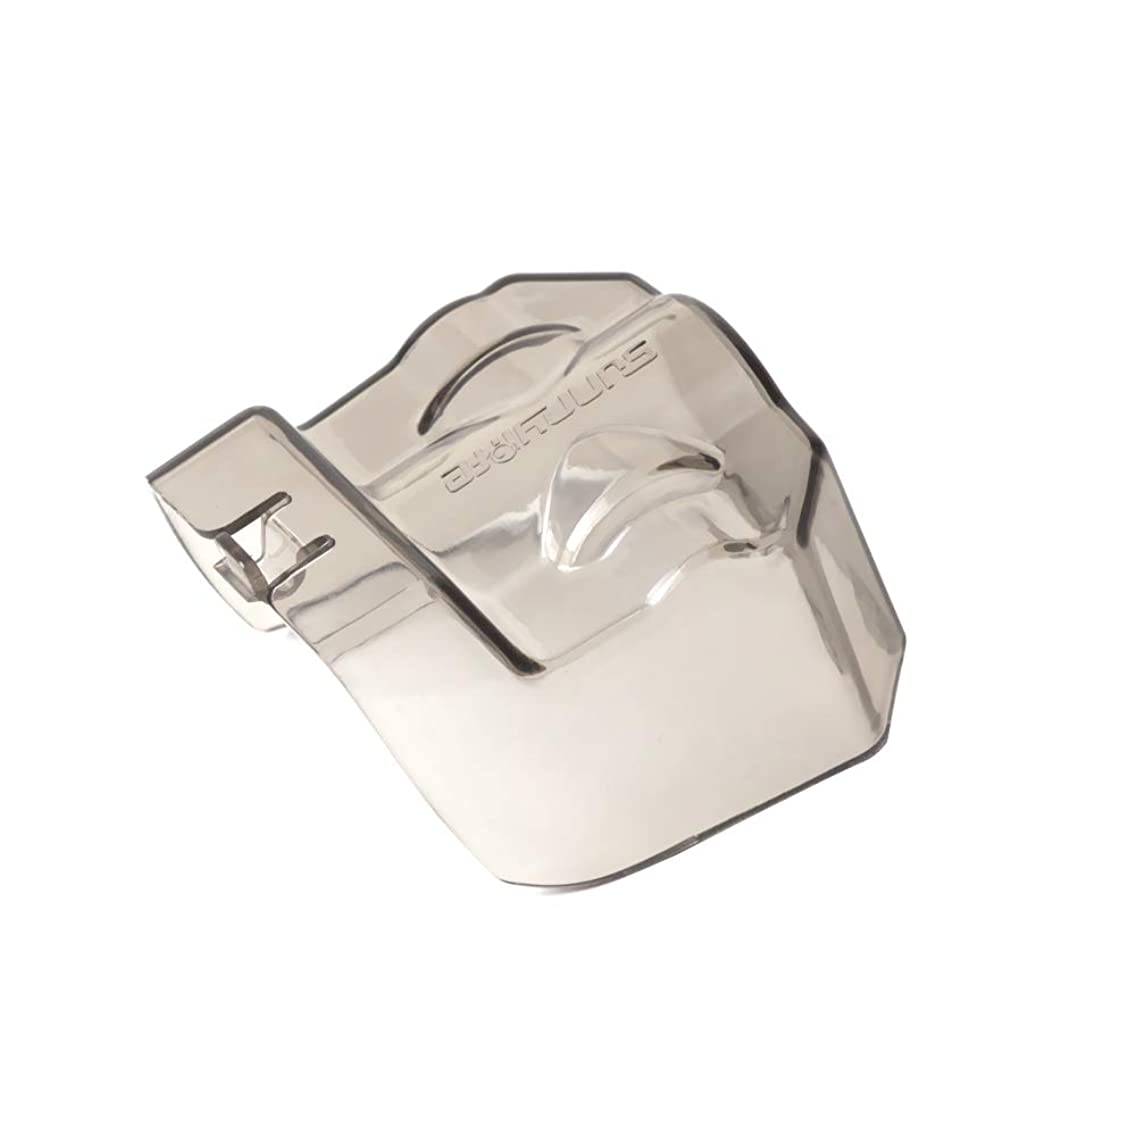 Tineer Gimbal Camera Protective Cap Fix Lens Cover for DJI Mavic 2 Zoom Drone Camera Accessories